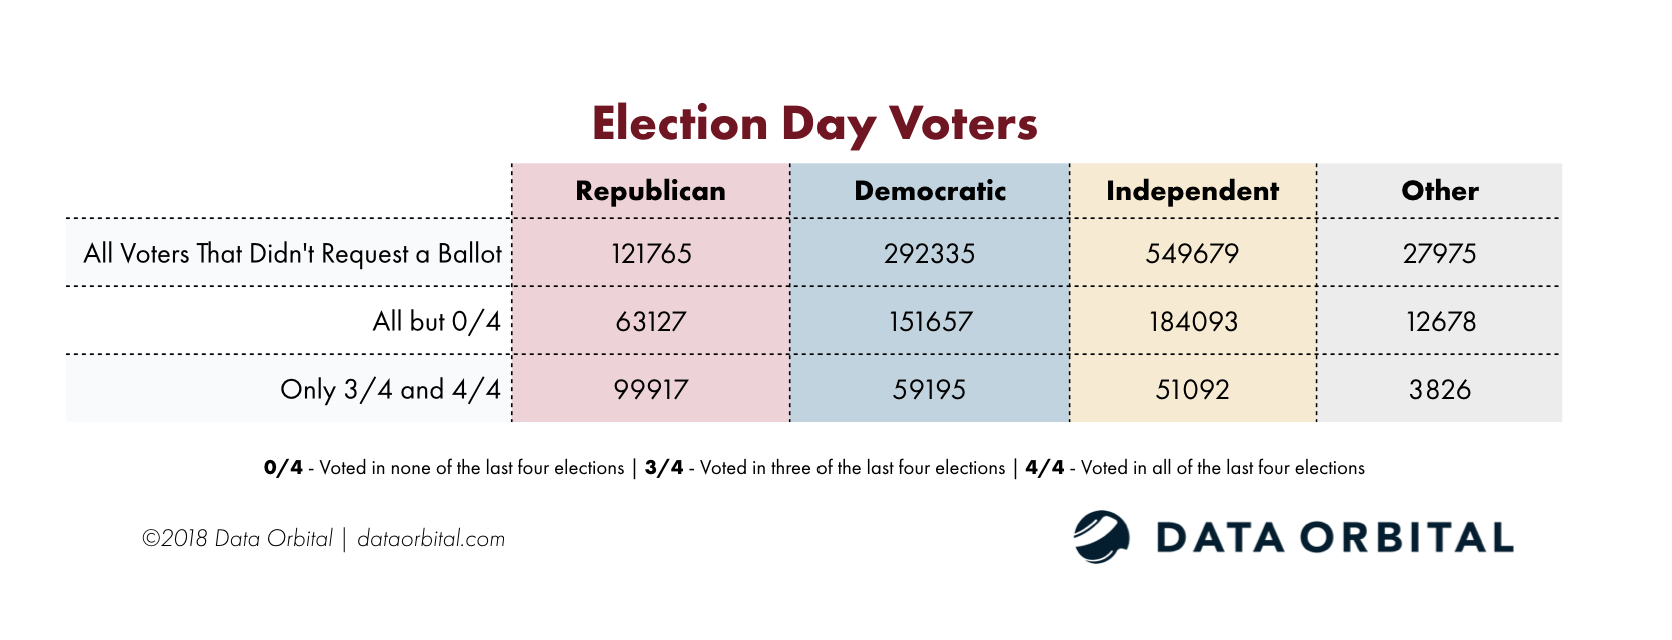 AZ Election Day Voters